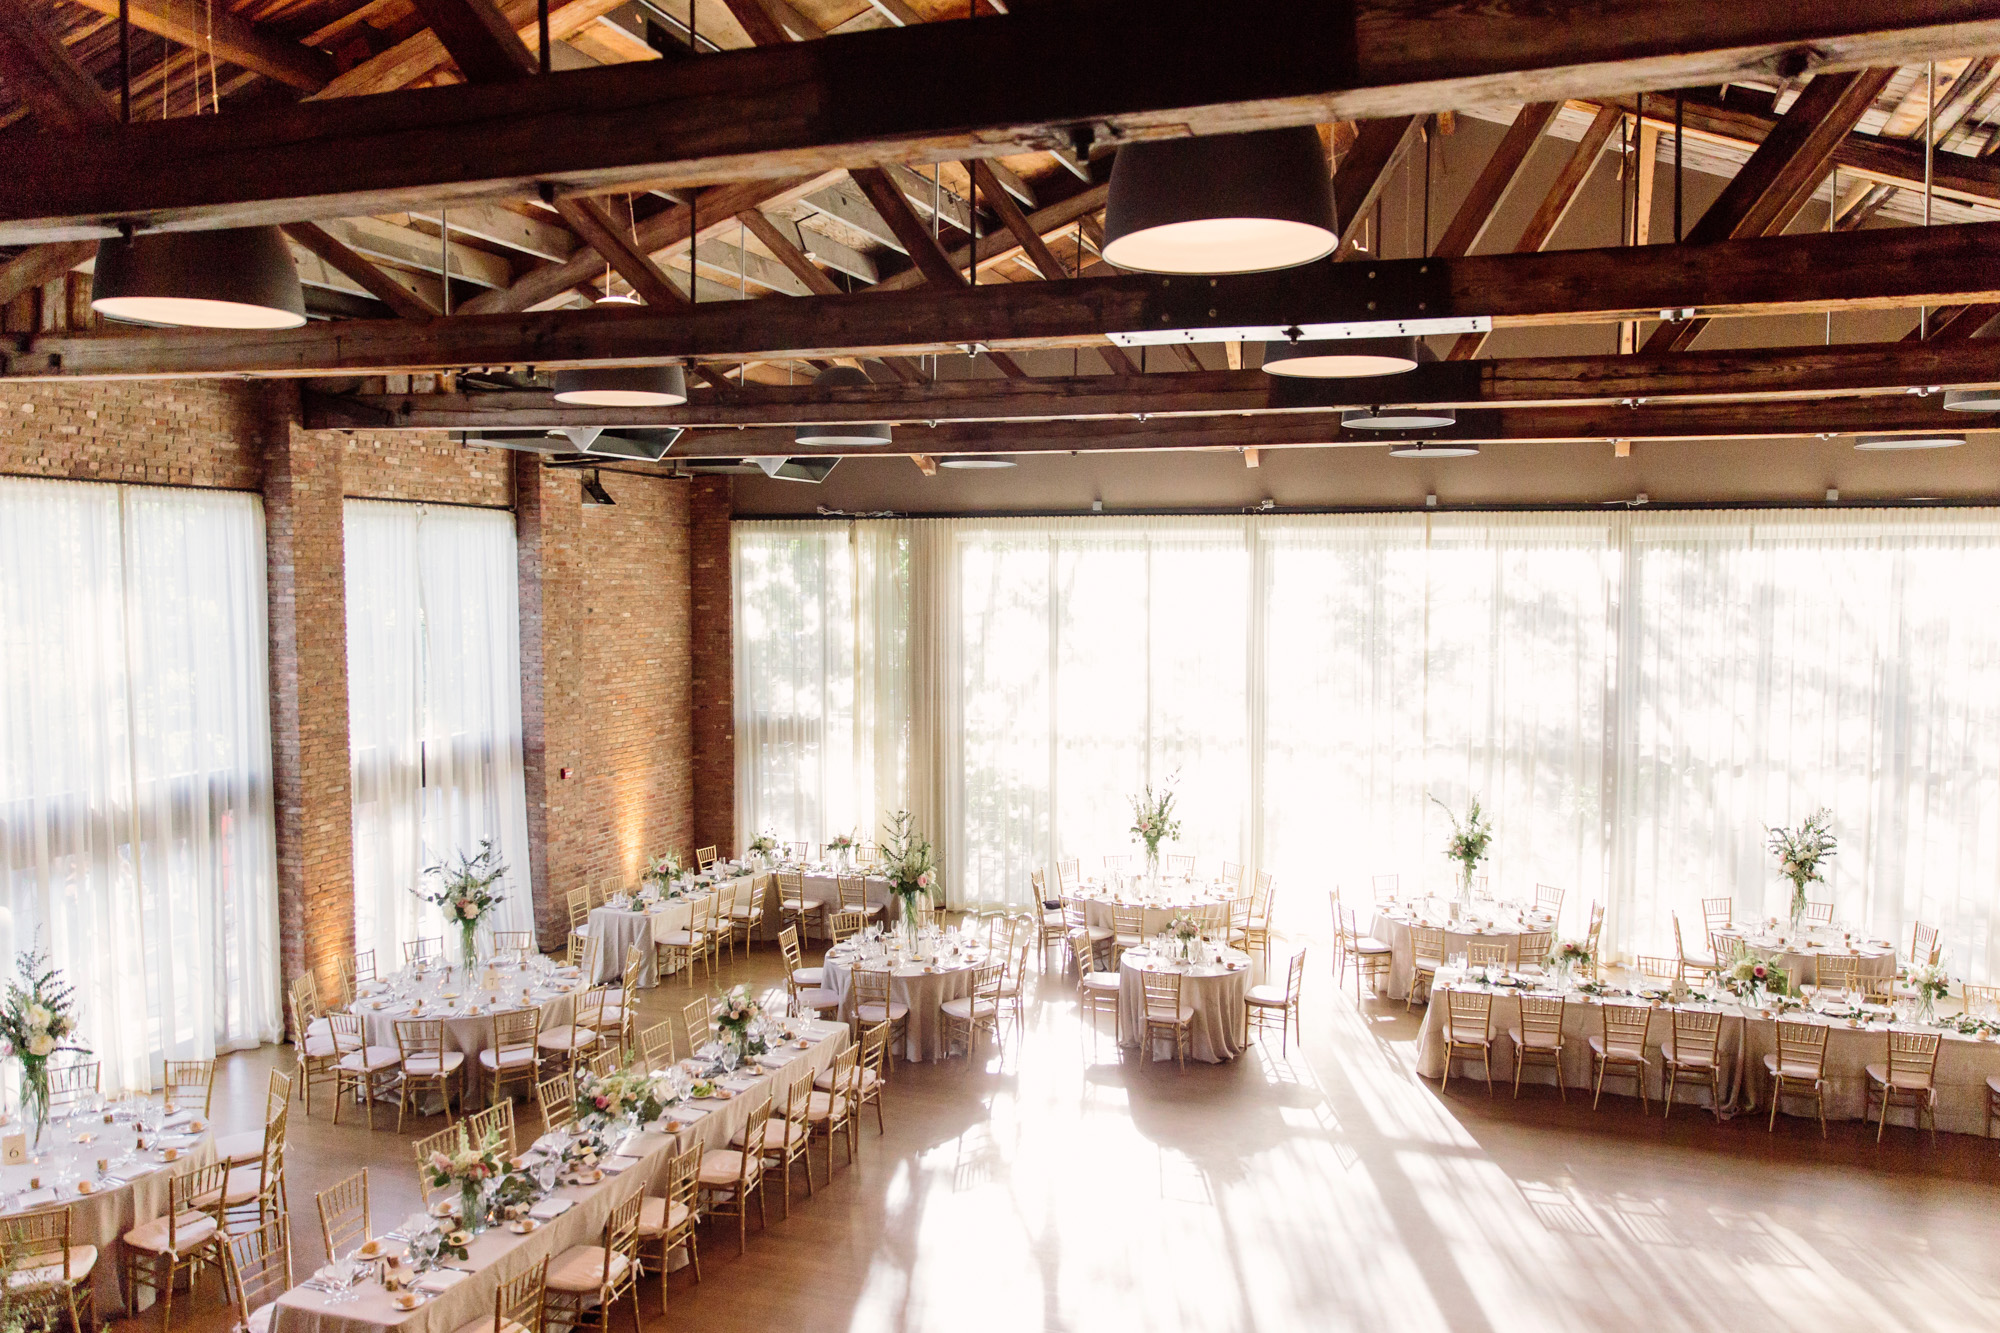 56_Rowan_Brian_The_Roundhouse_Wedding_Beacon_NY_Tanya_Salazar_Photography_1151.jpg